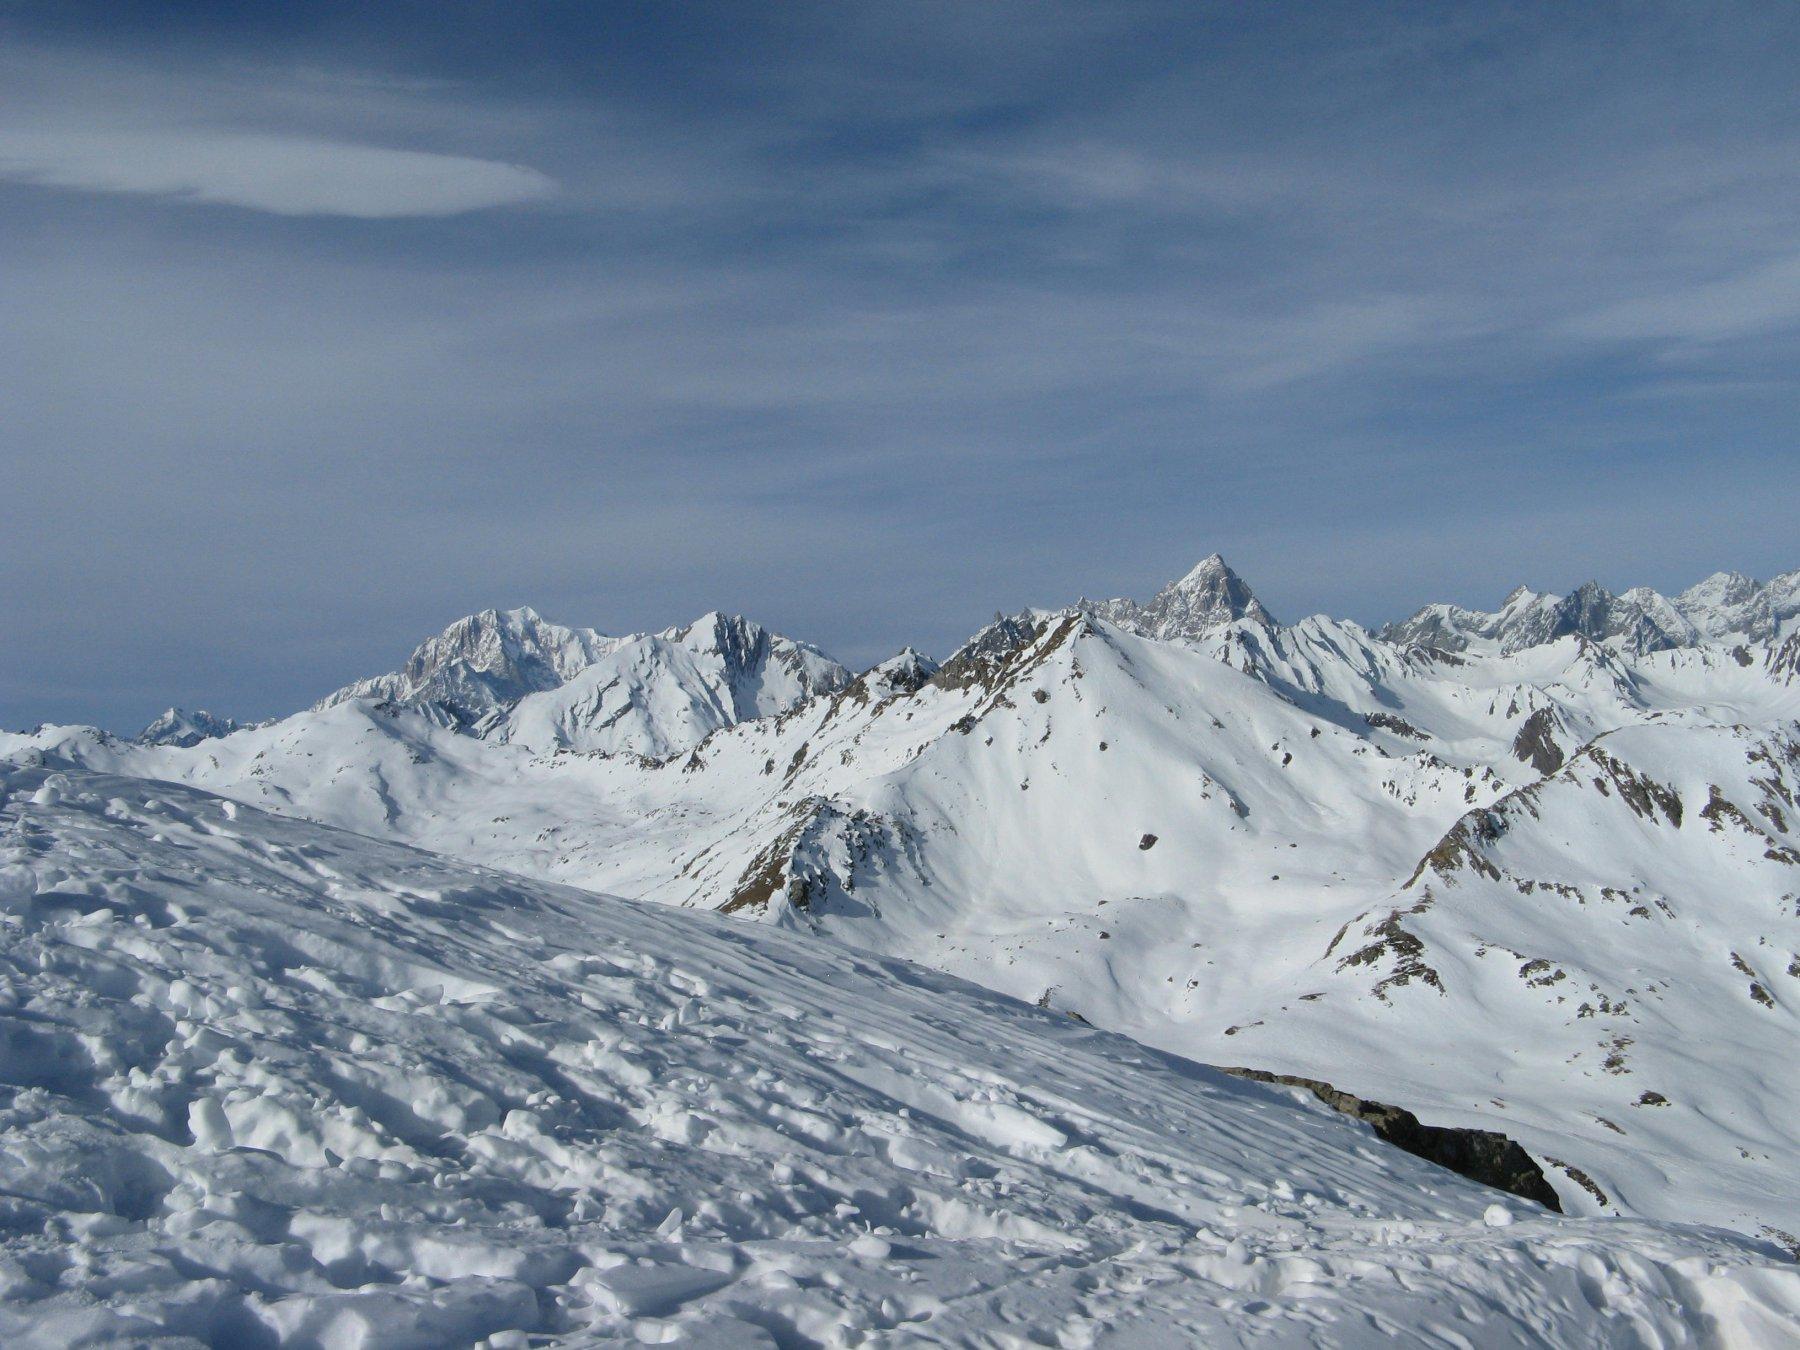 Panorama su Bianco e Jorasses da poco sotto la cima